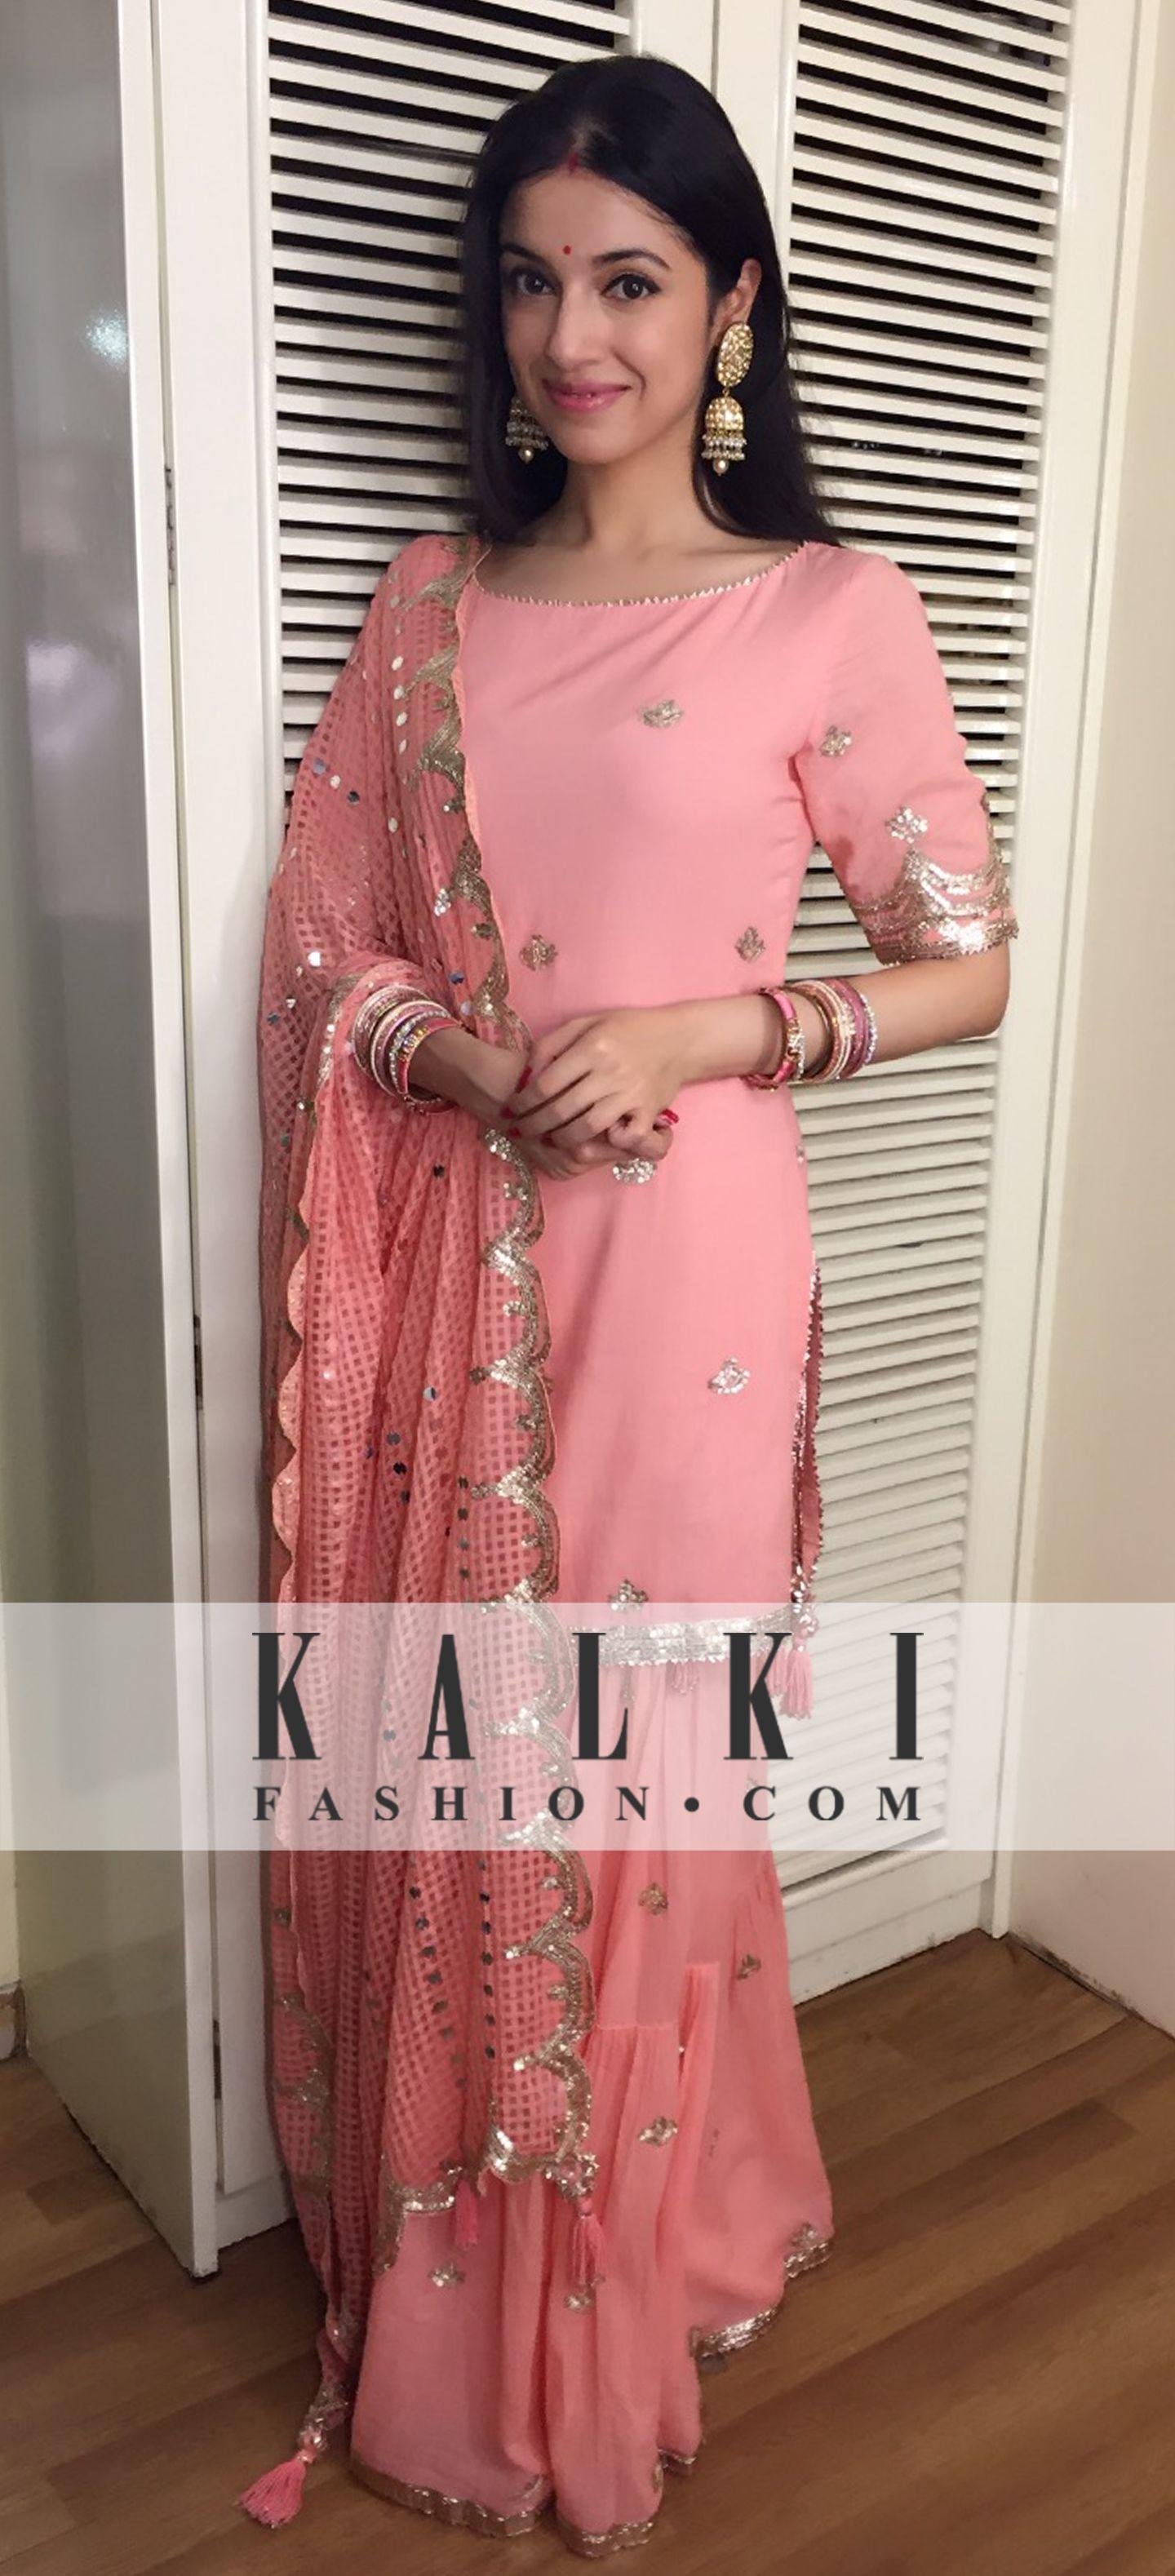 Divya Khosla Kumar: Dressed like a diva in a simple pink salwaar ...